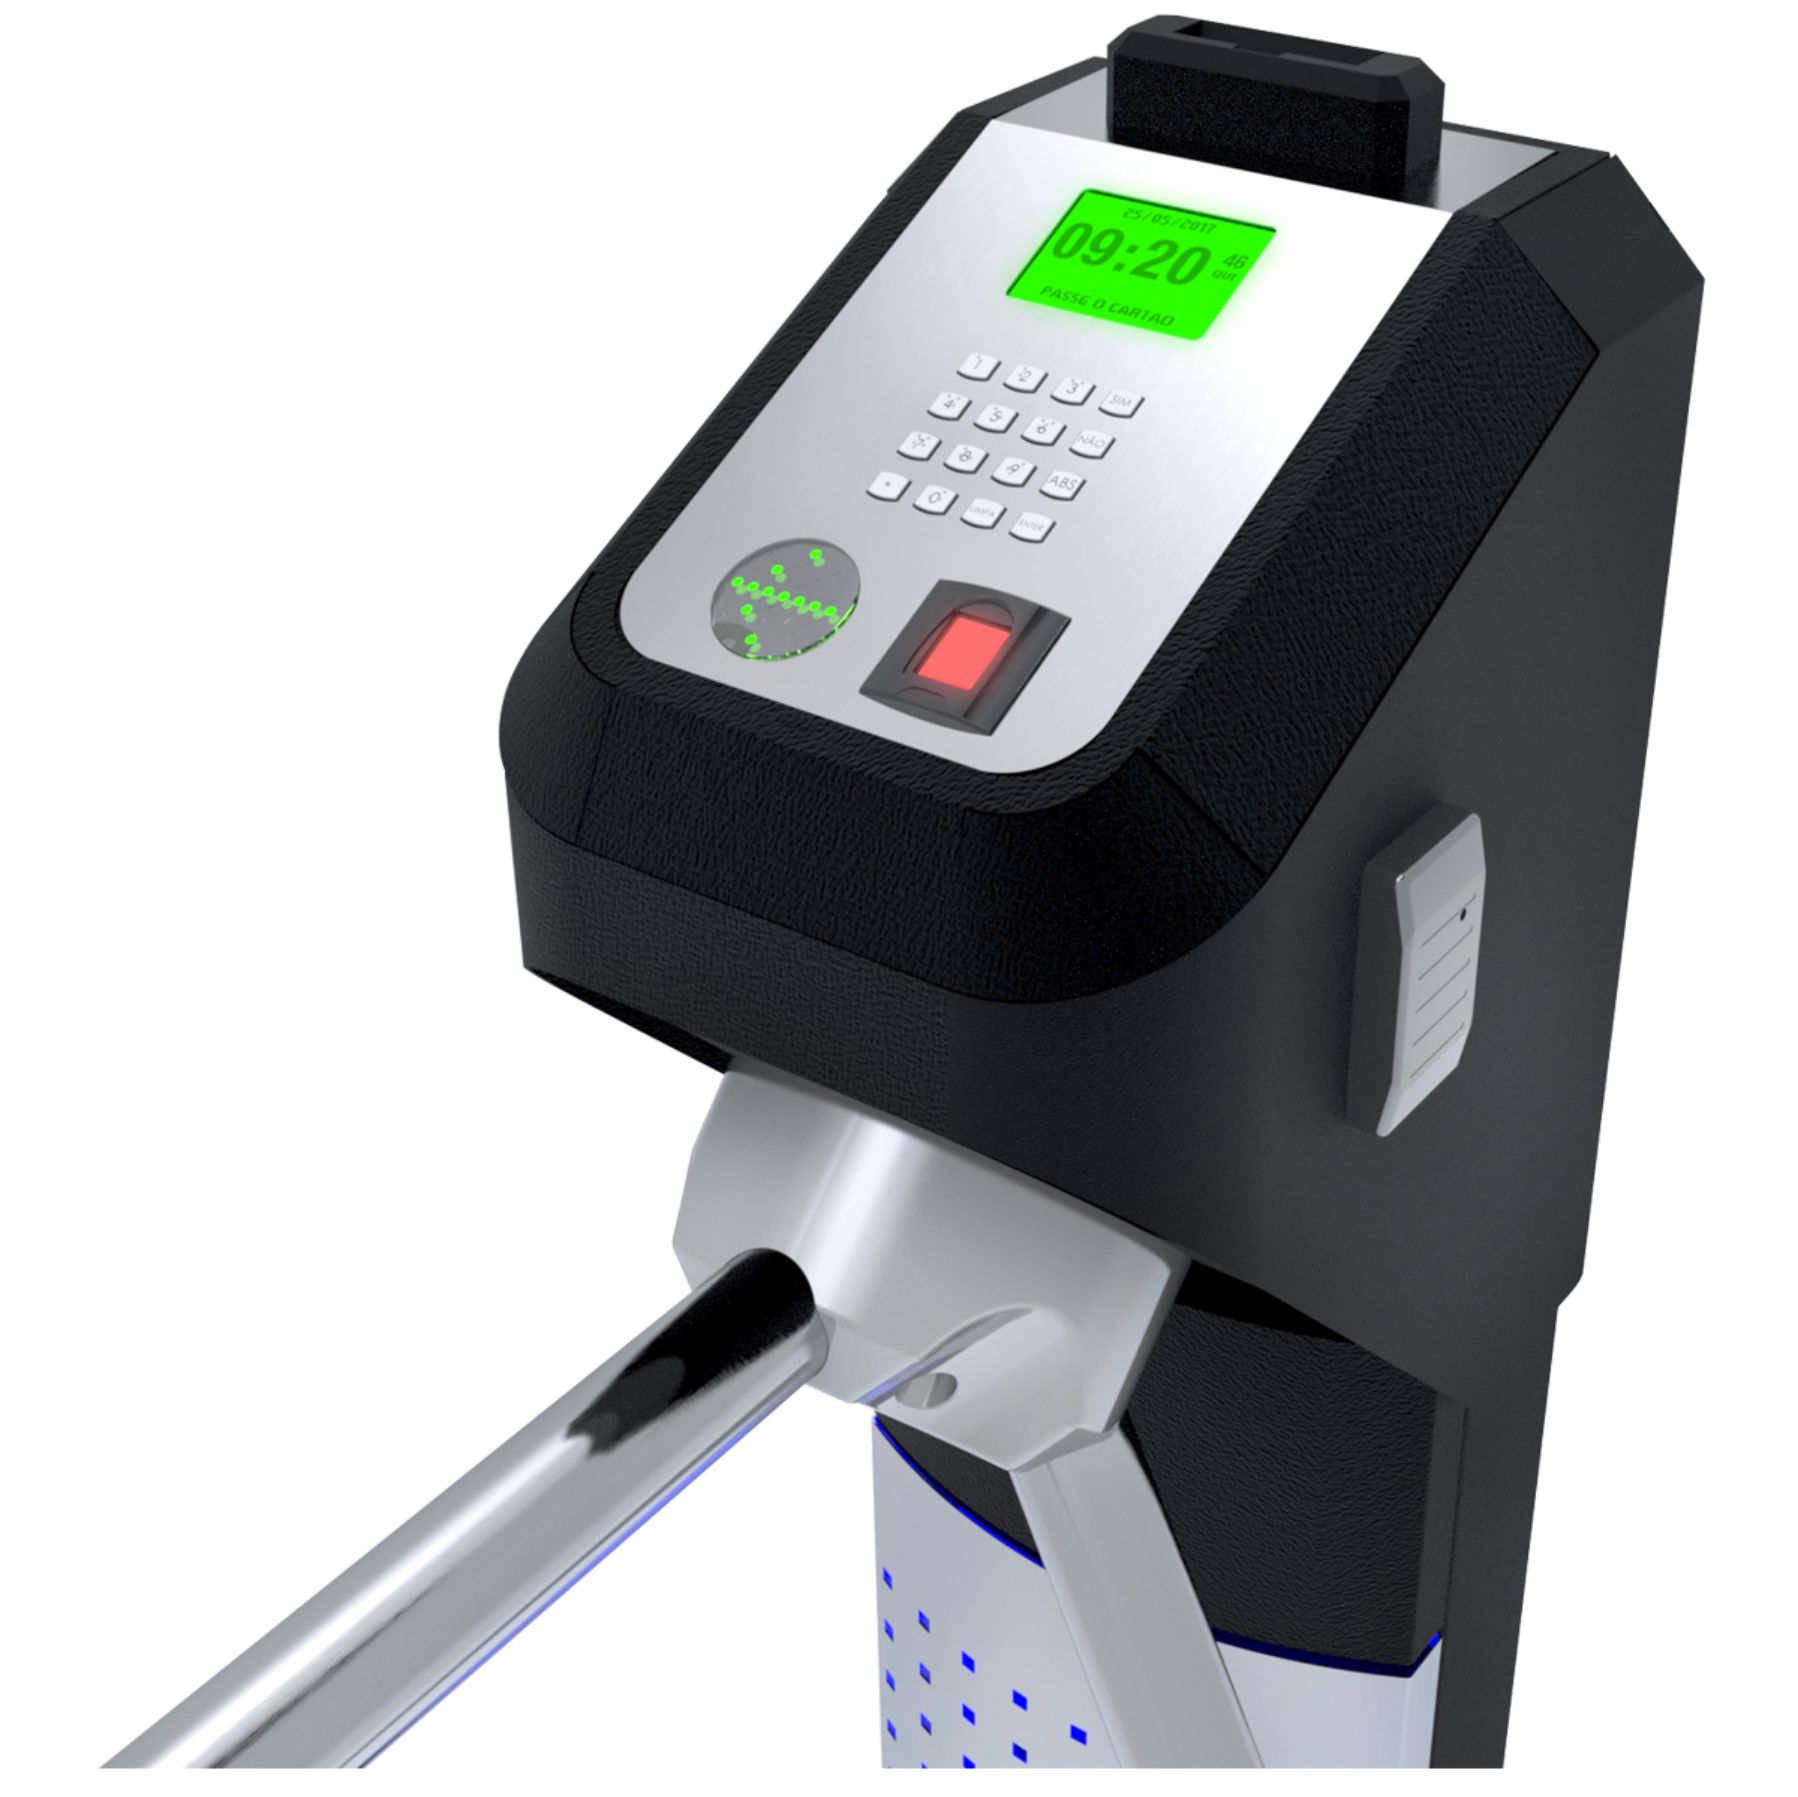 Catraca Lumen Adv Biometria e Proximidade c/ Cofre Embutido